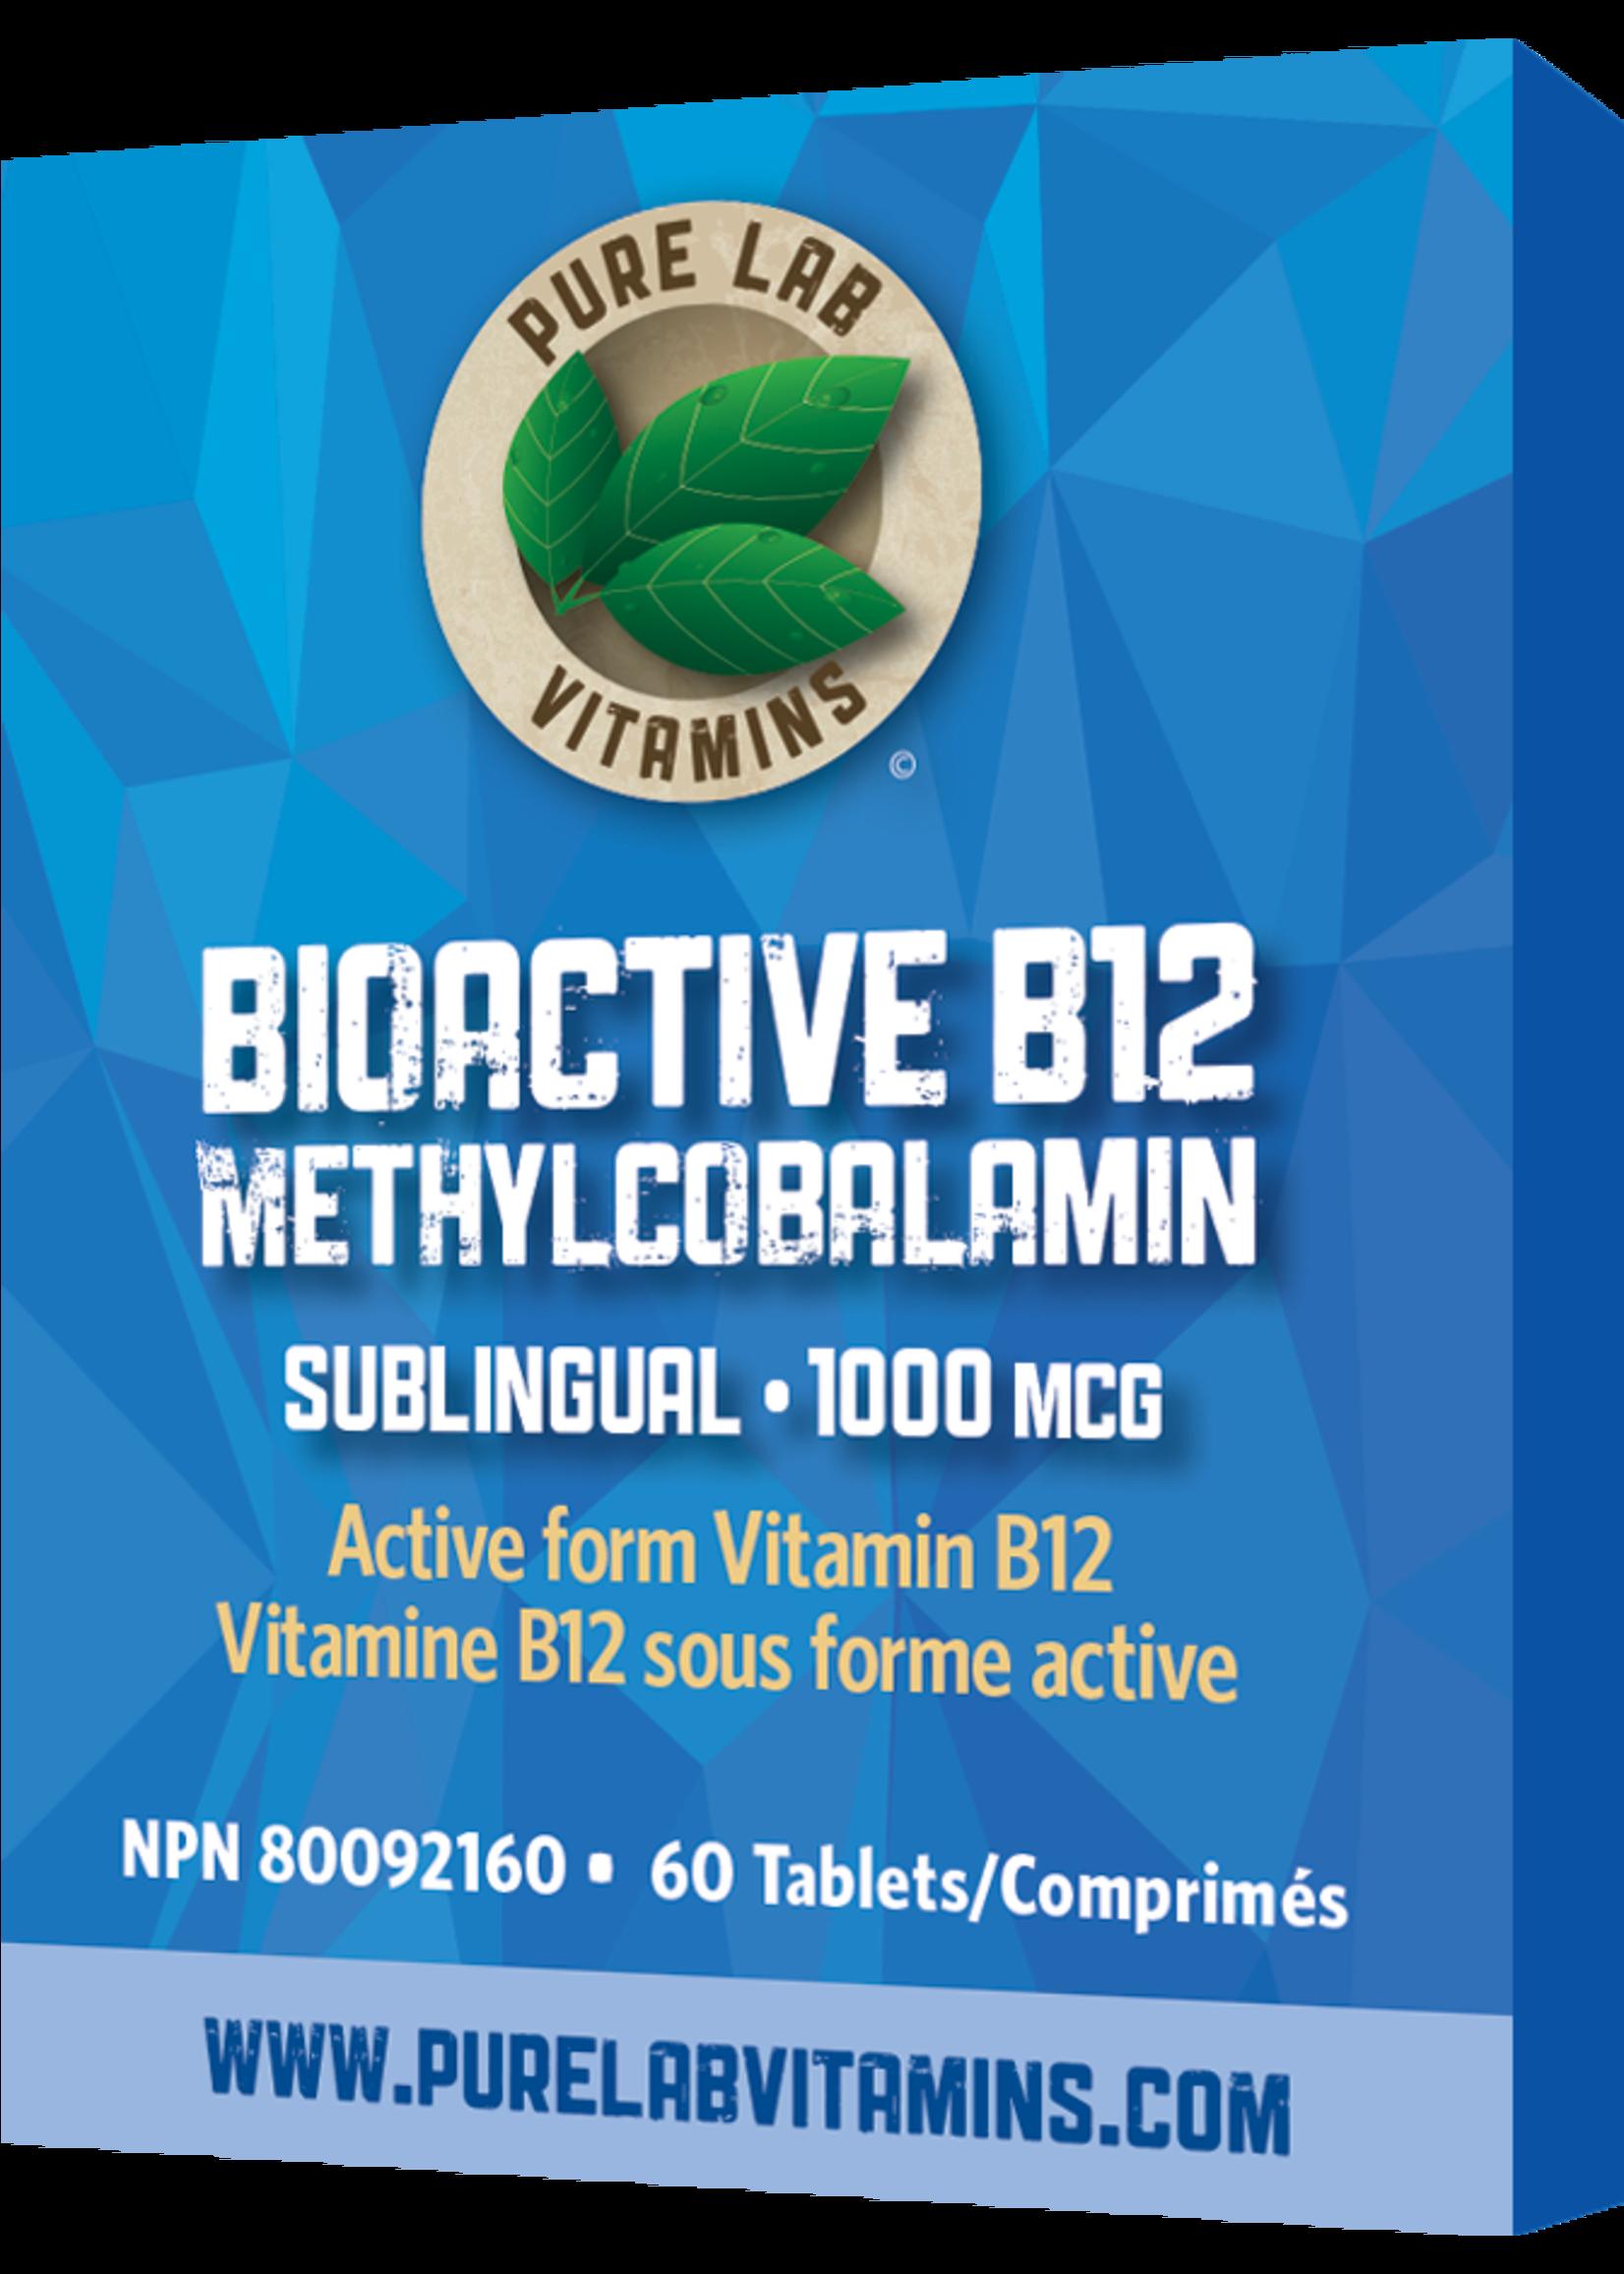 Pure lab Pure Lab Bioactive B12 1000mcg Sublingual